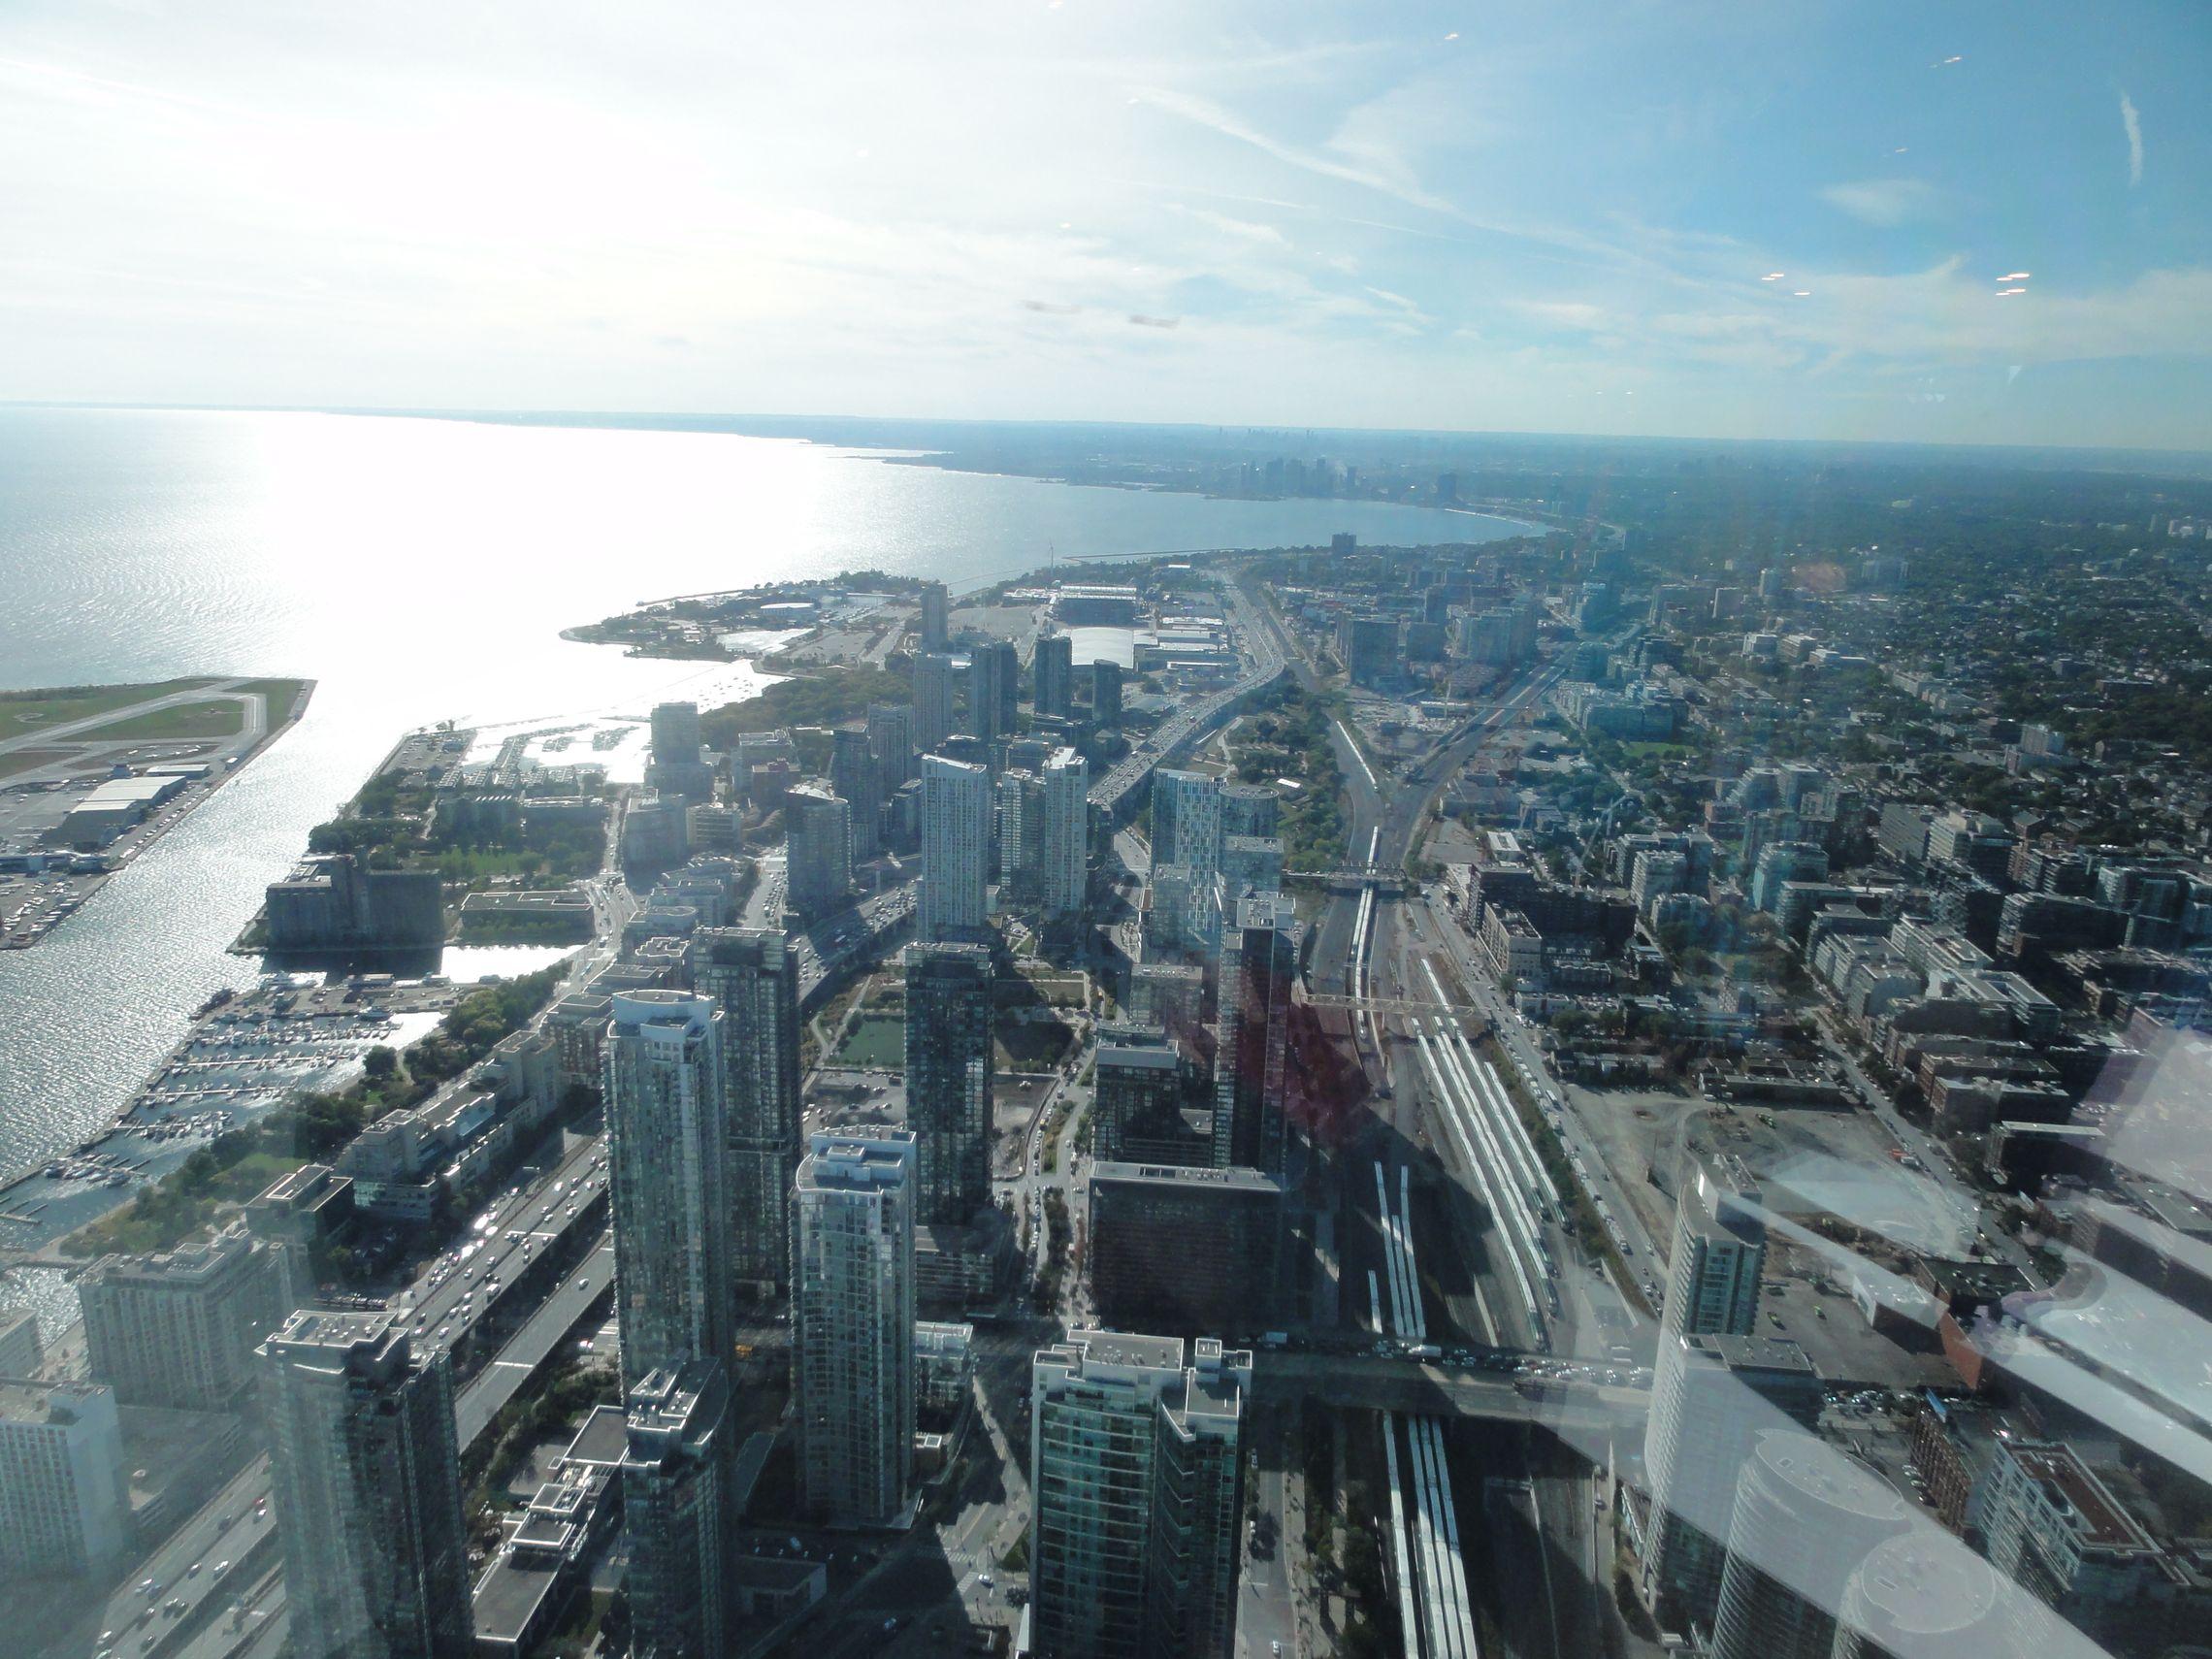 20171002 Toronto 05